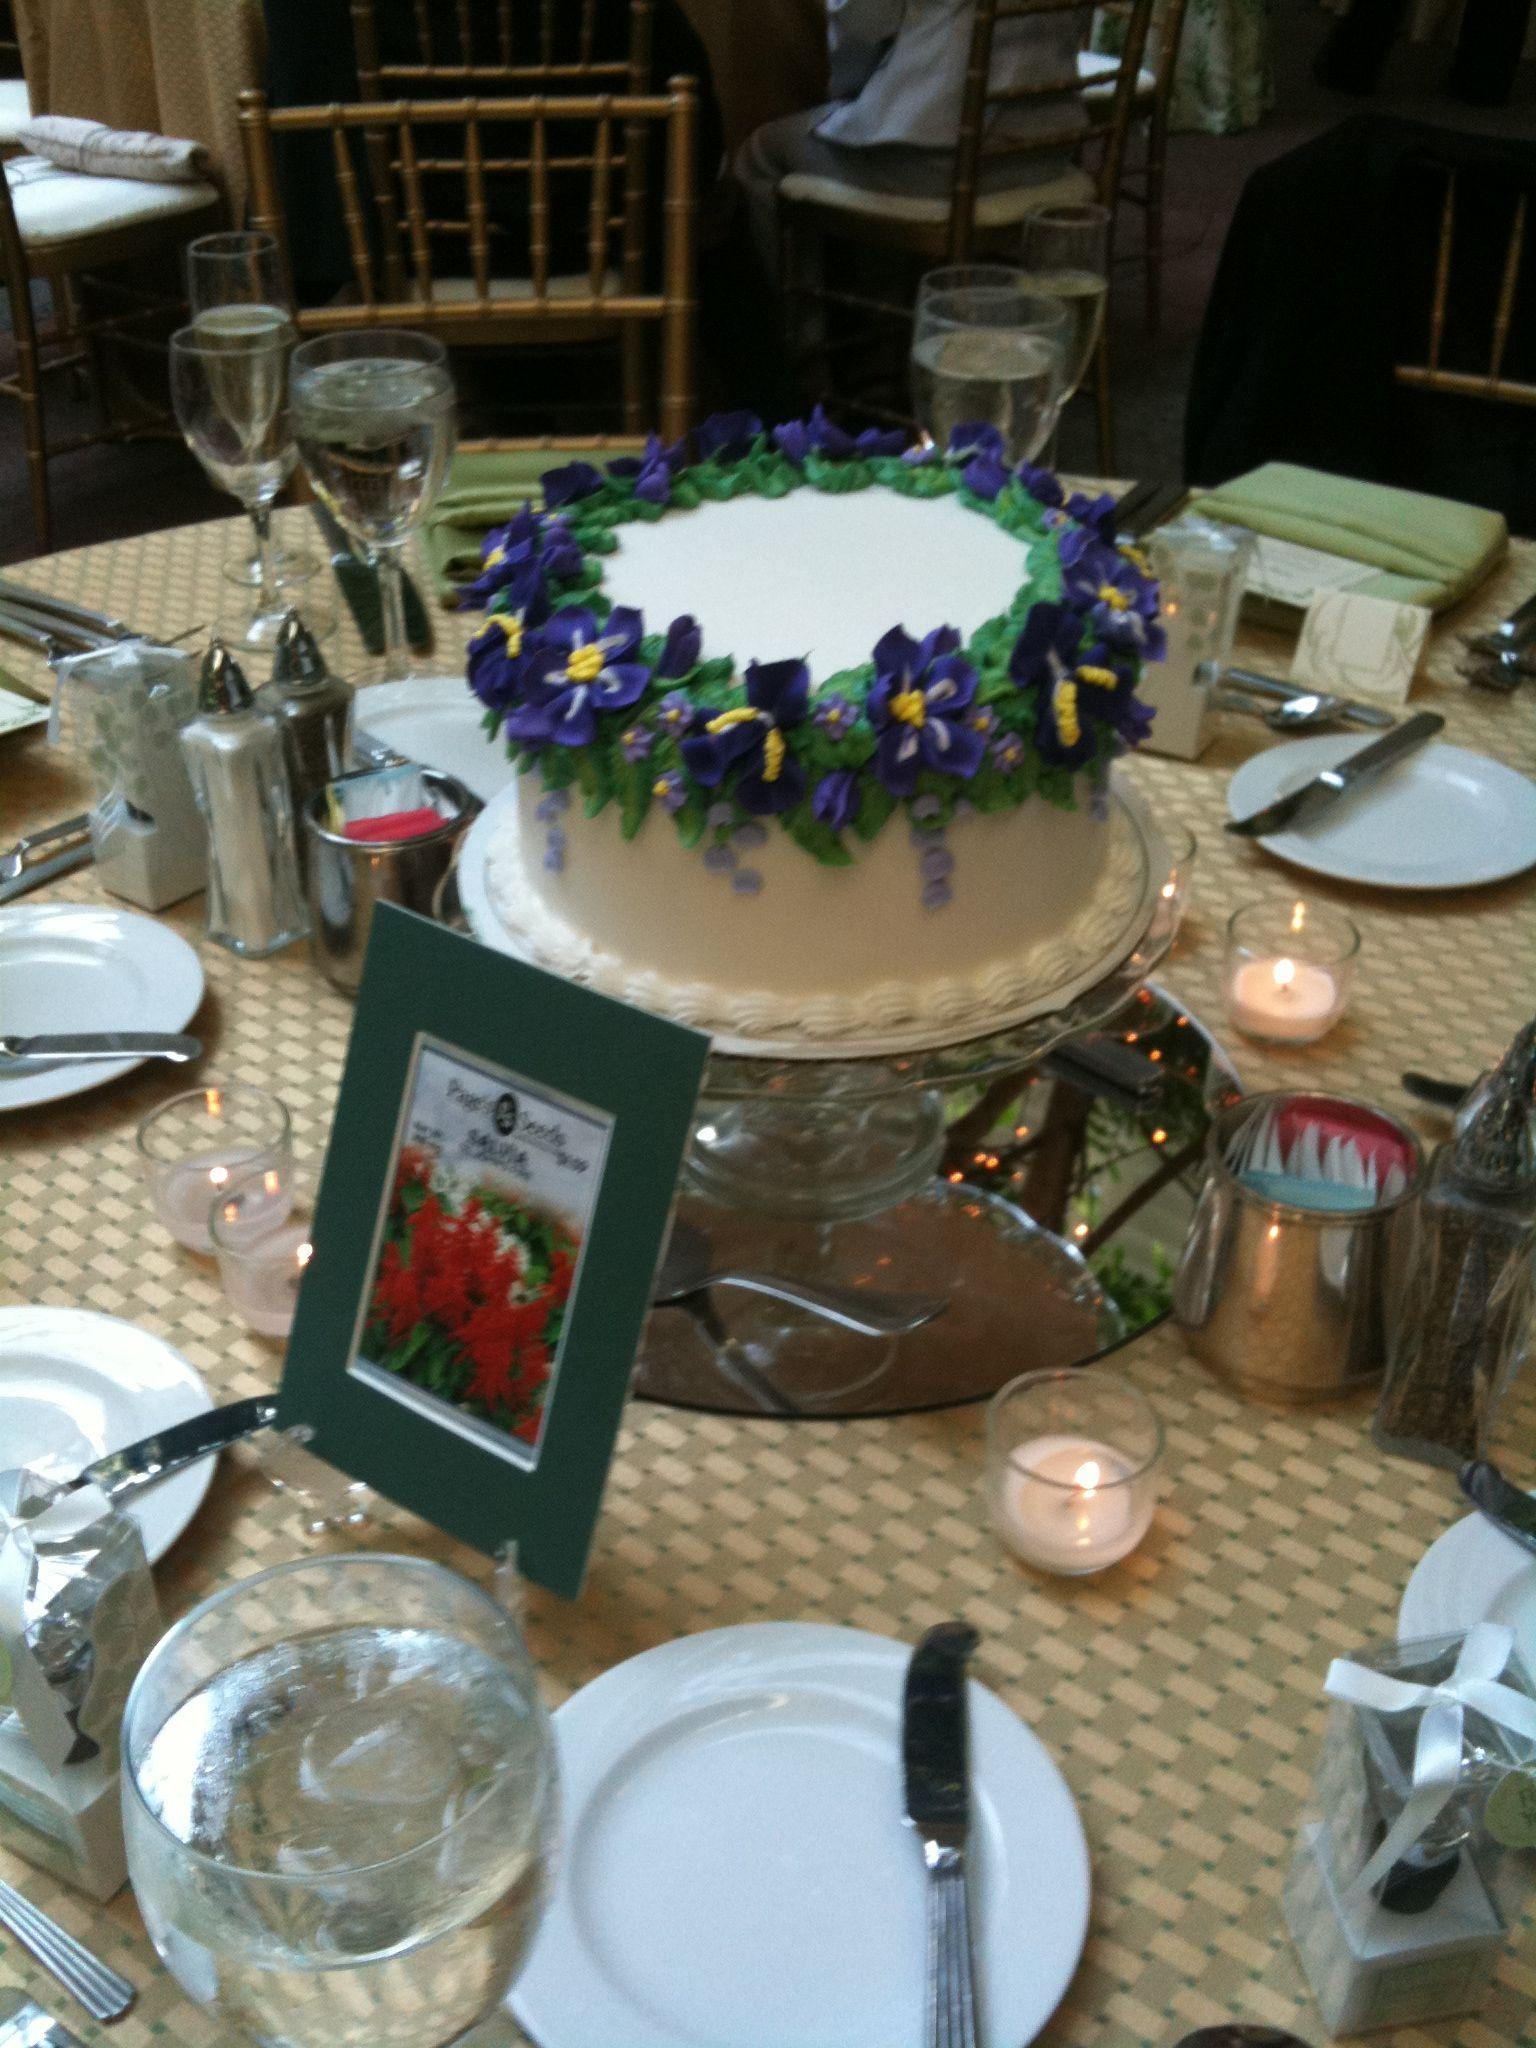 Astonishing Really Neat Idea Wedding Cake Centerpieces For Each Table Download Free Architecture Designs Pendunizatbritishbridgeorg